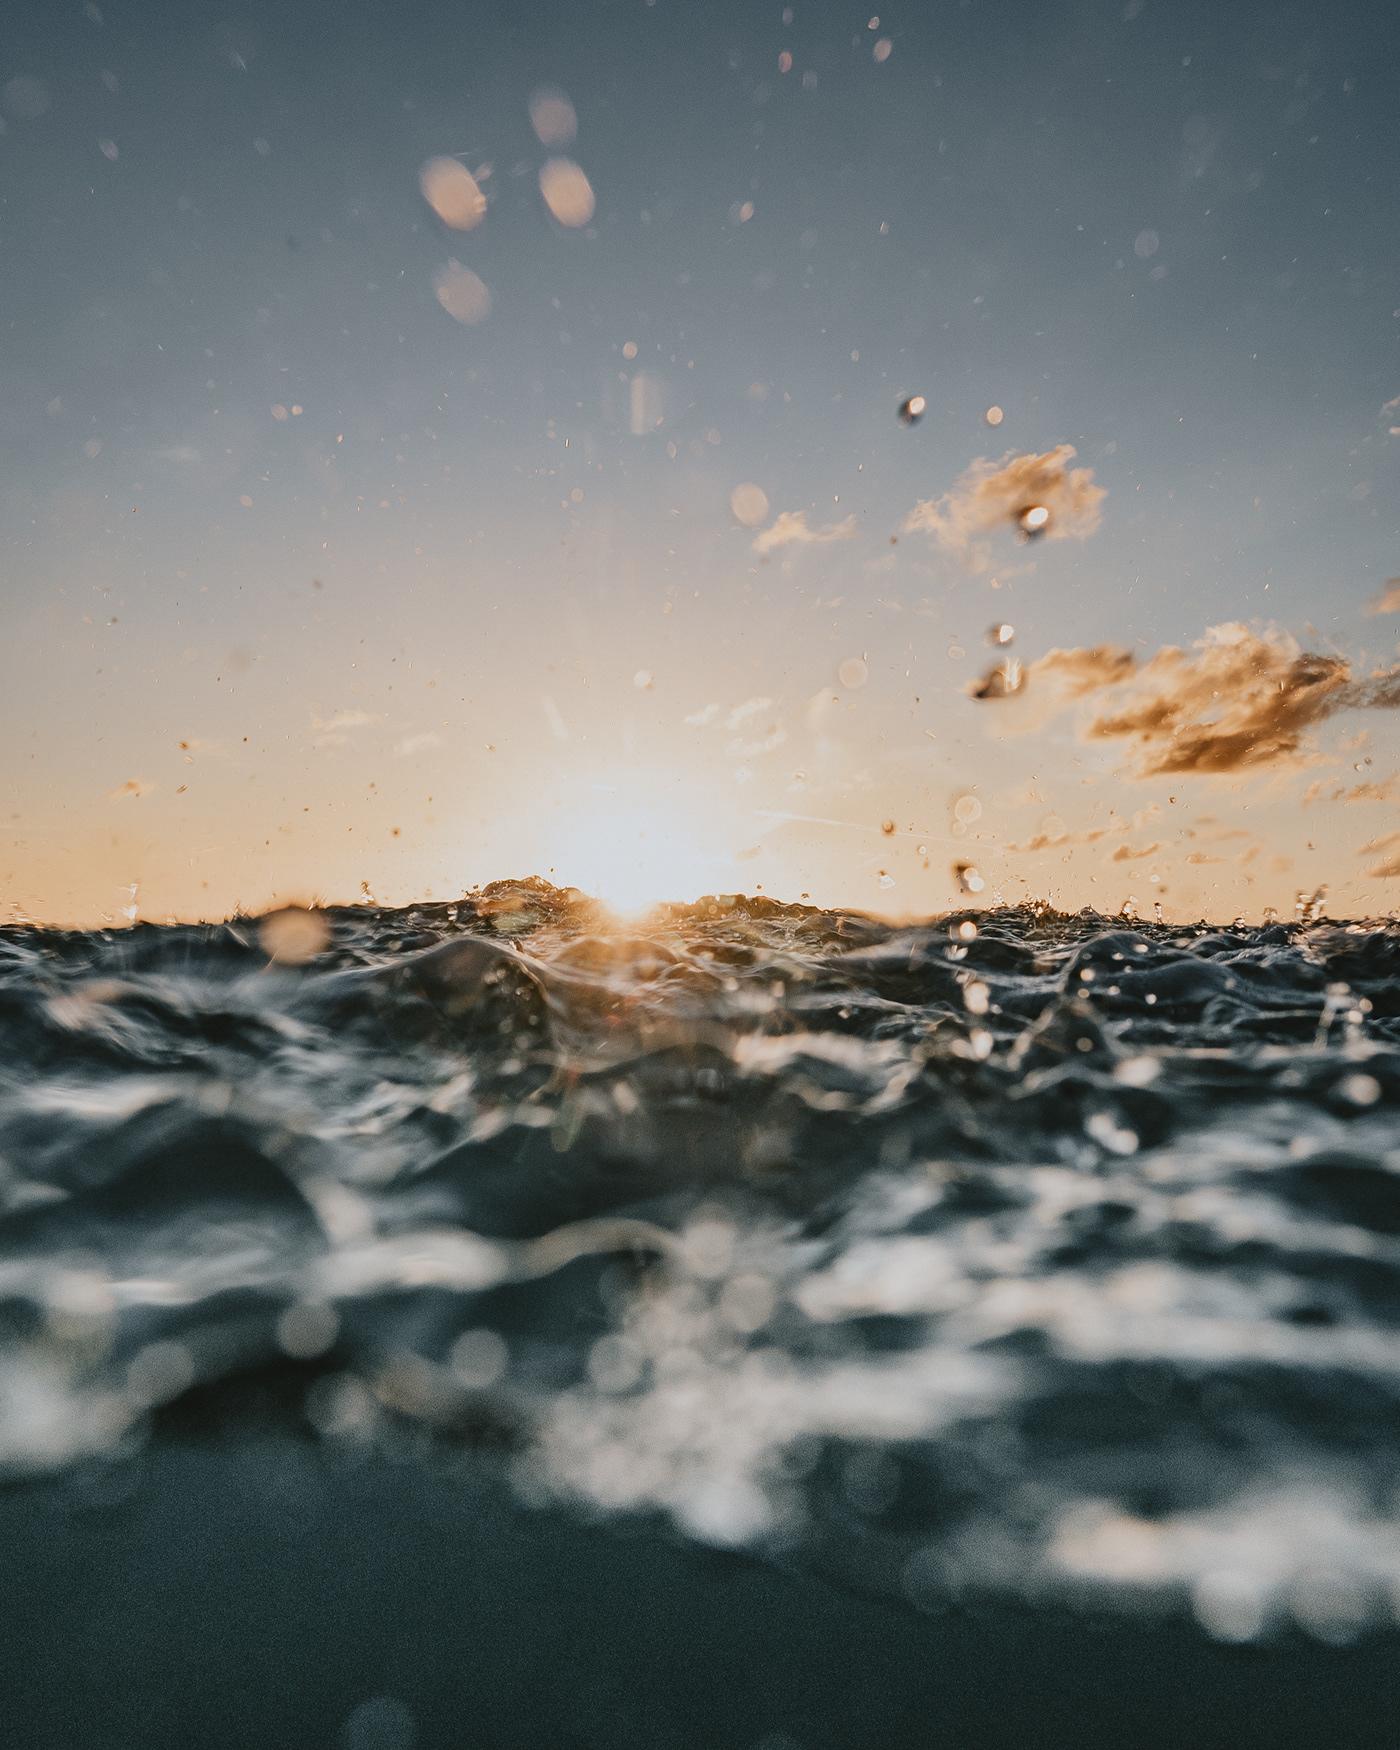 Ocean people Photography  portraits underwater UNDERWATER PHOTOGRAPHY waves